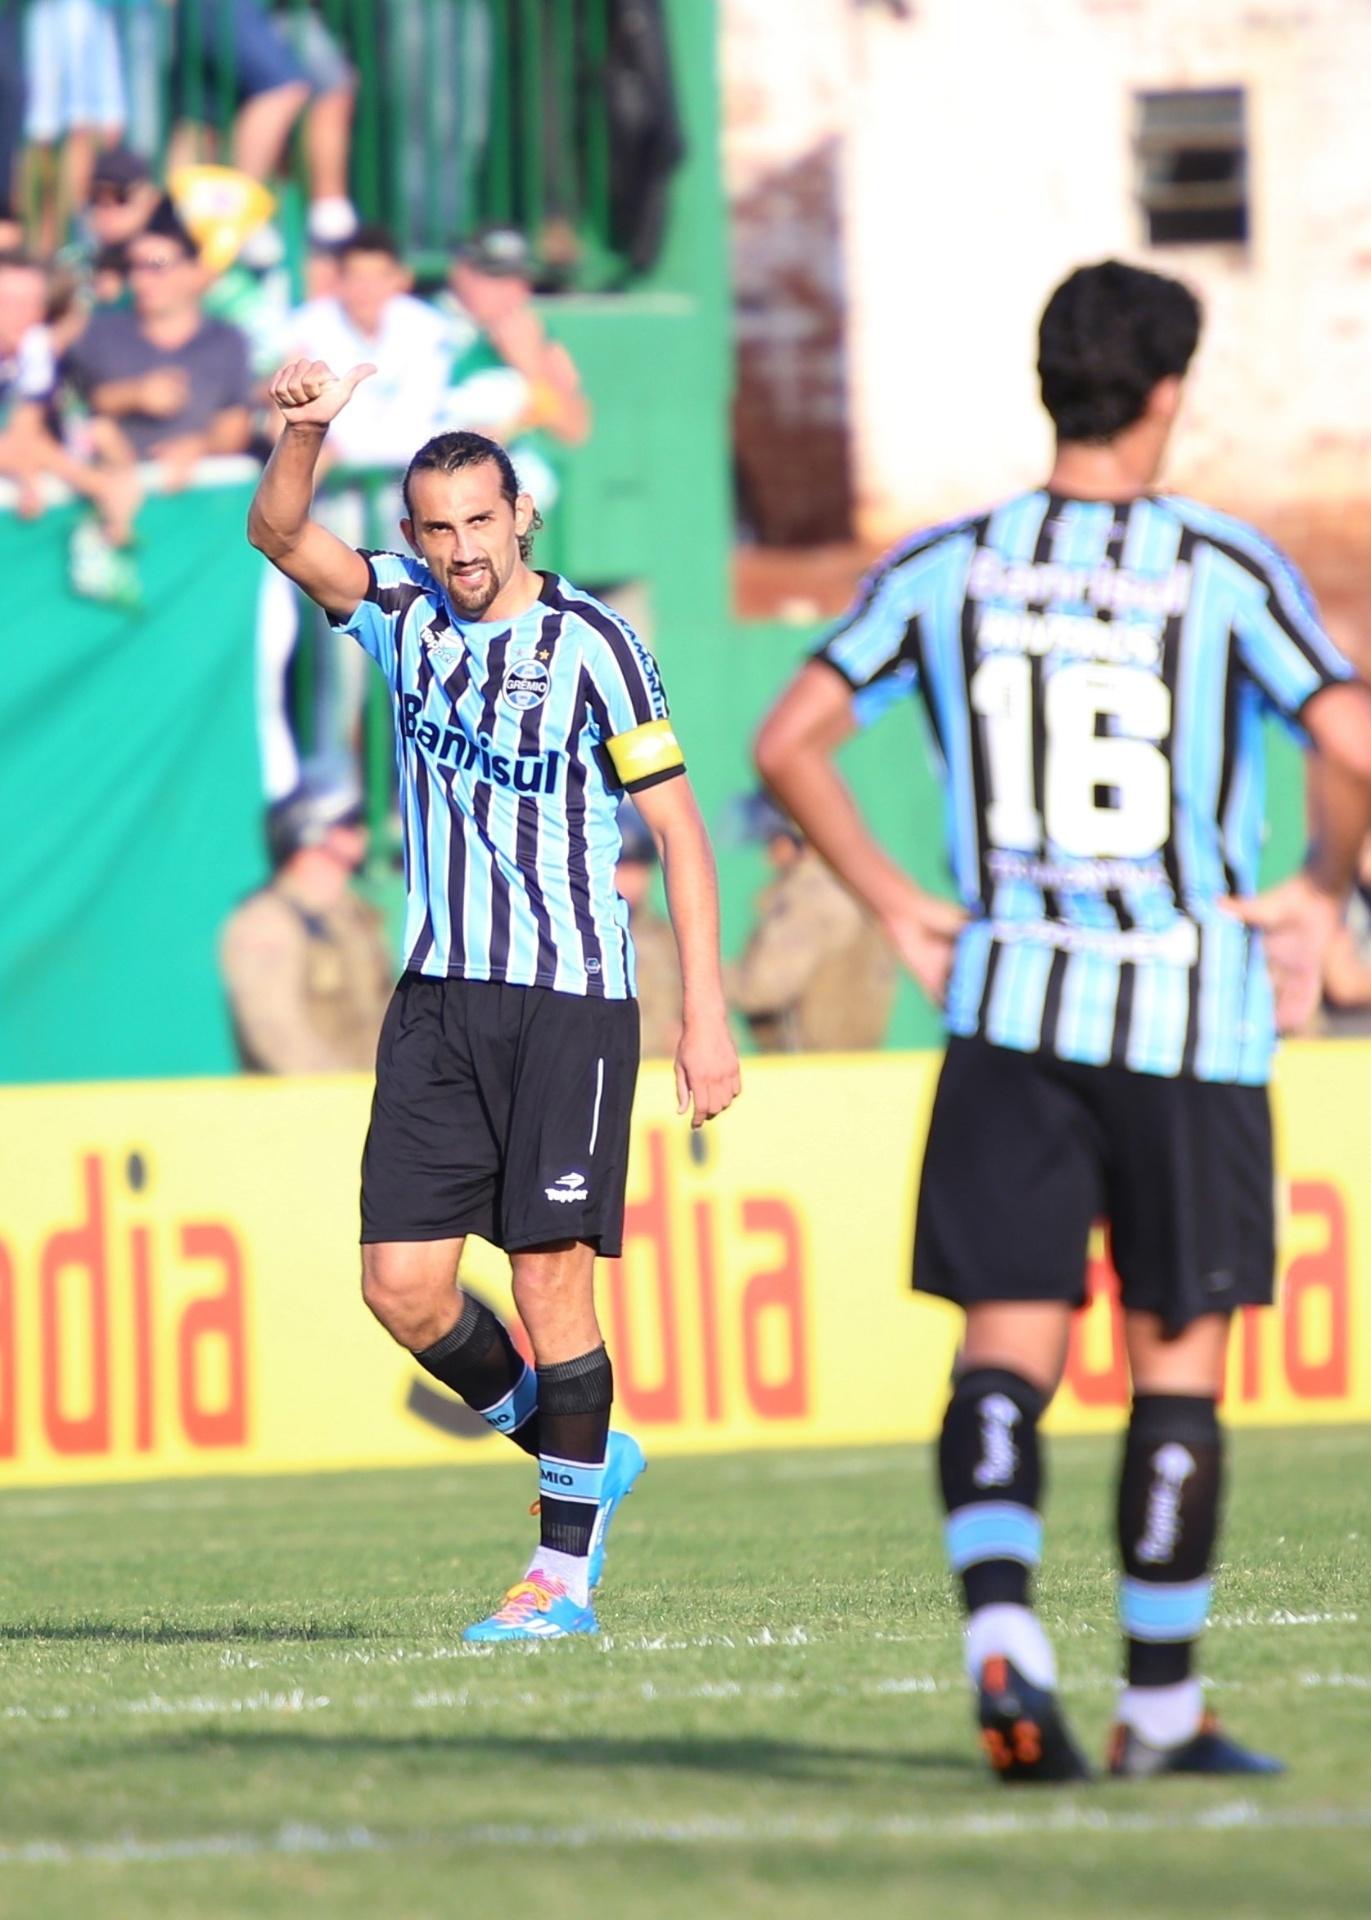 Barcos cumprimenta companheiros do Grêmio depois de marcar o primeiro gol contra a Chapecoense - 11.05.14